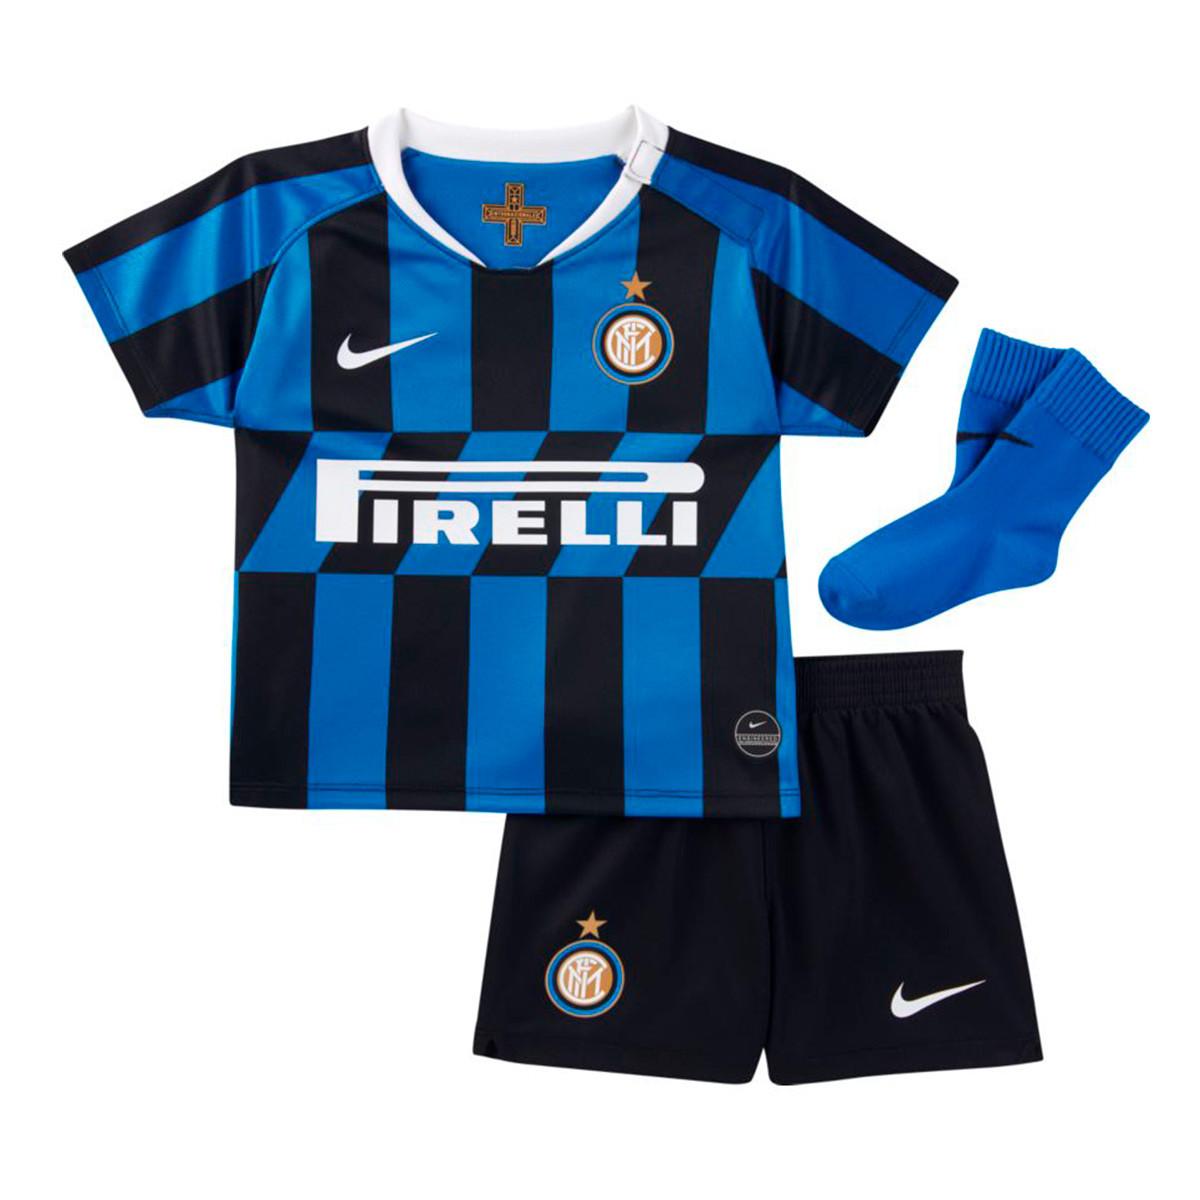 e0b5a7e1 Kit Nike Infant Inter Milan Breathe 2019-2020 Home Blue spark-White ...